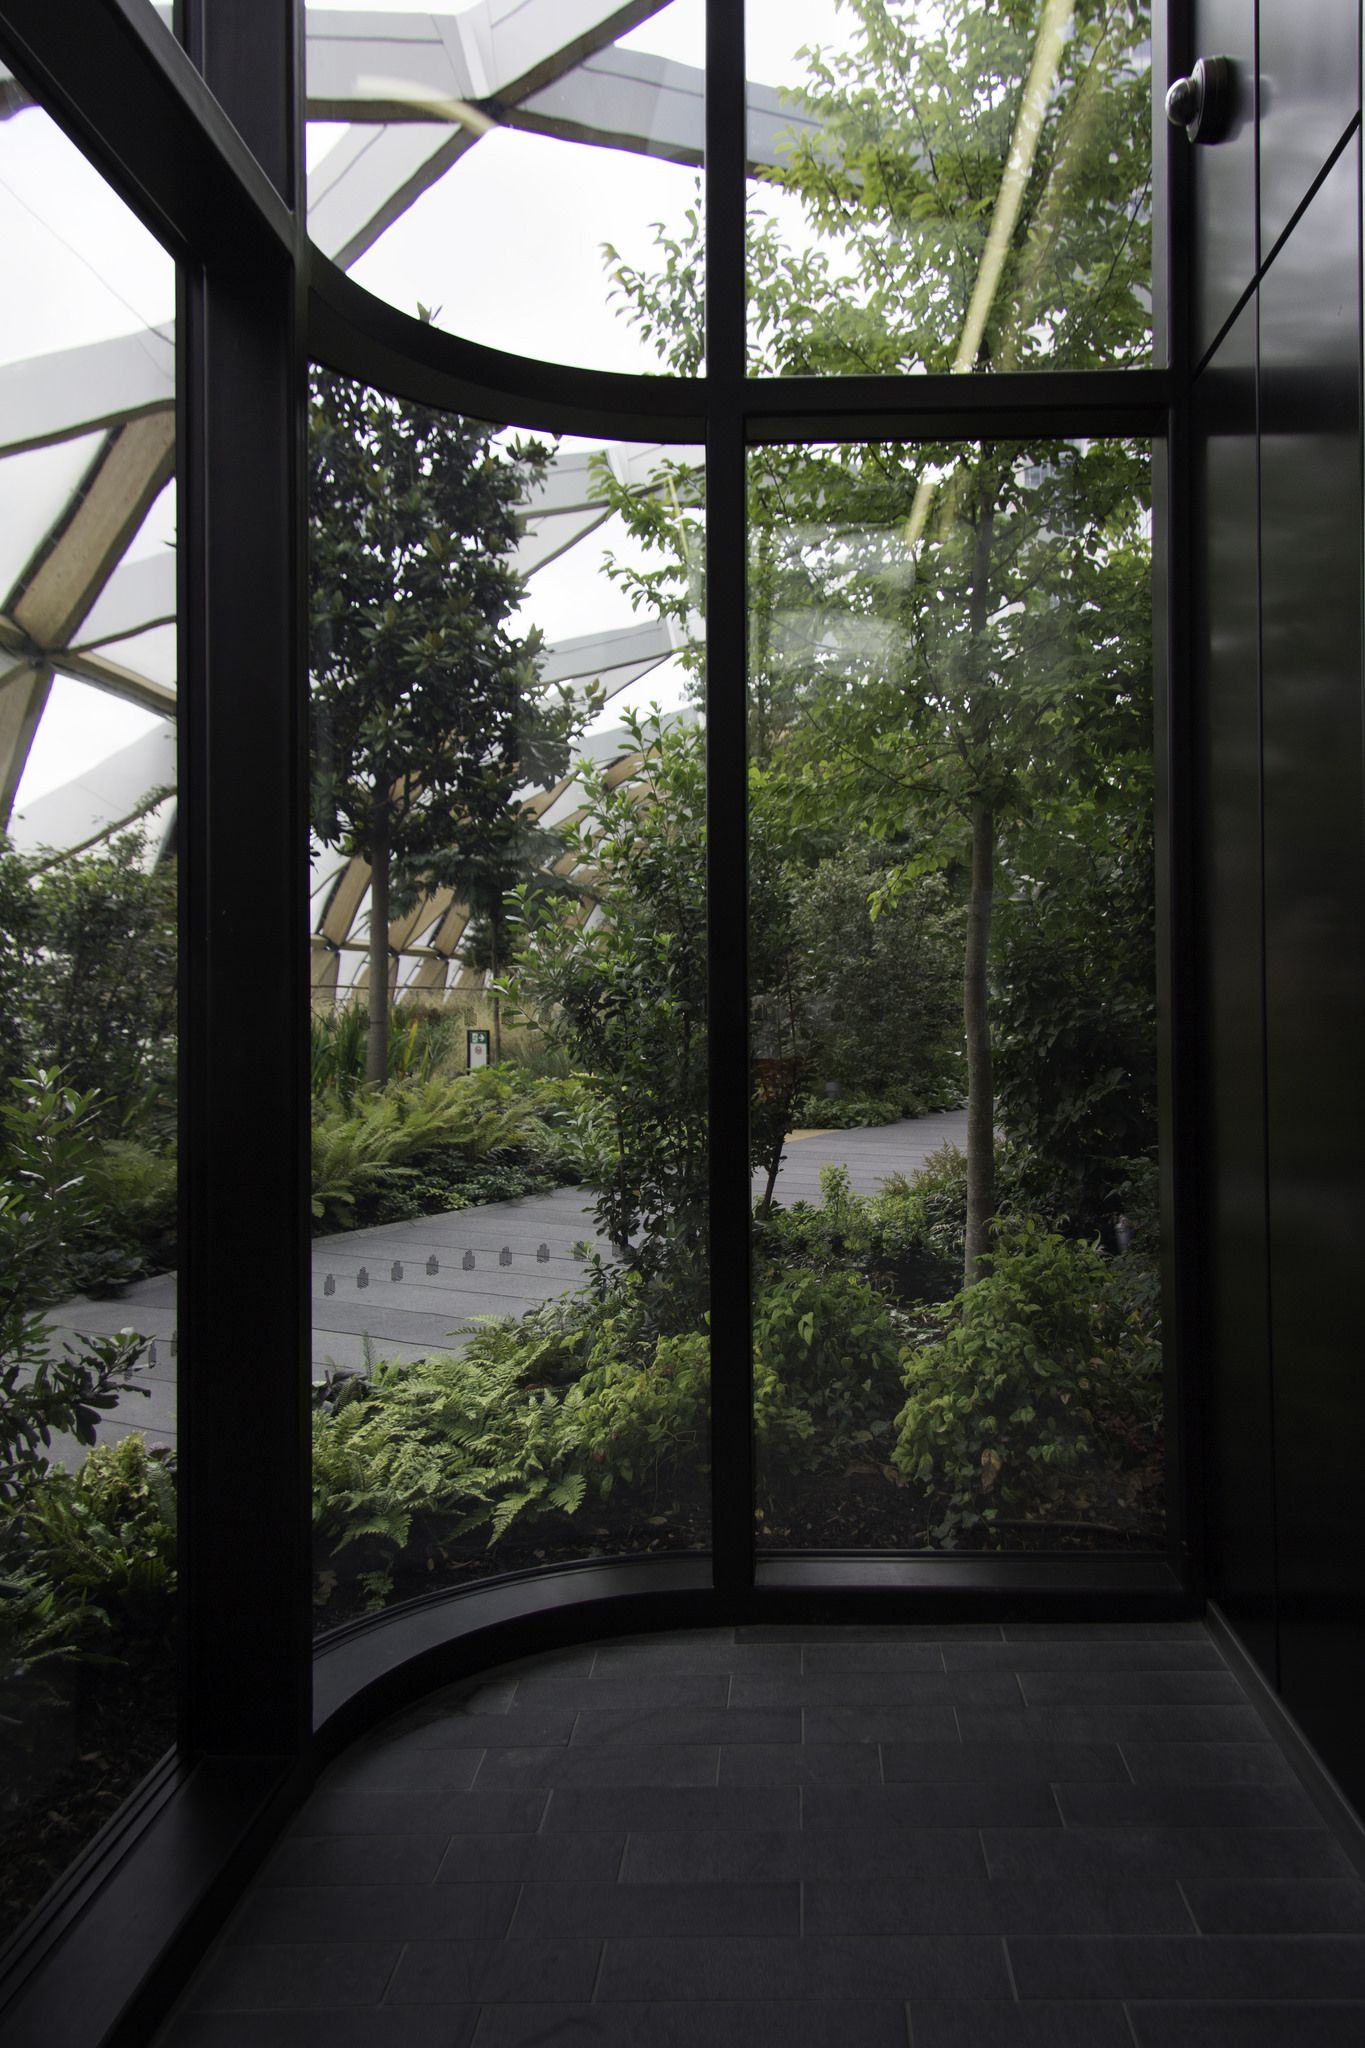 https://flic.kr/p/xdGH6m   Crossrail Roof Garden, Canary Wharf, London